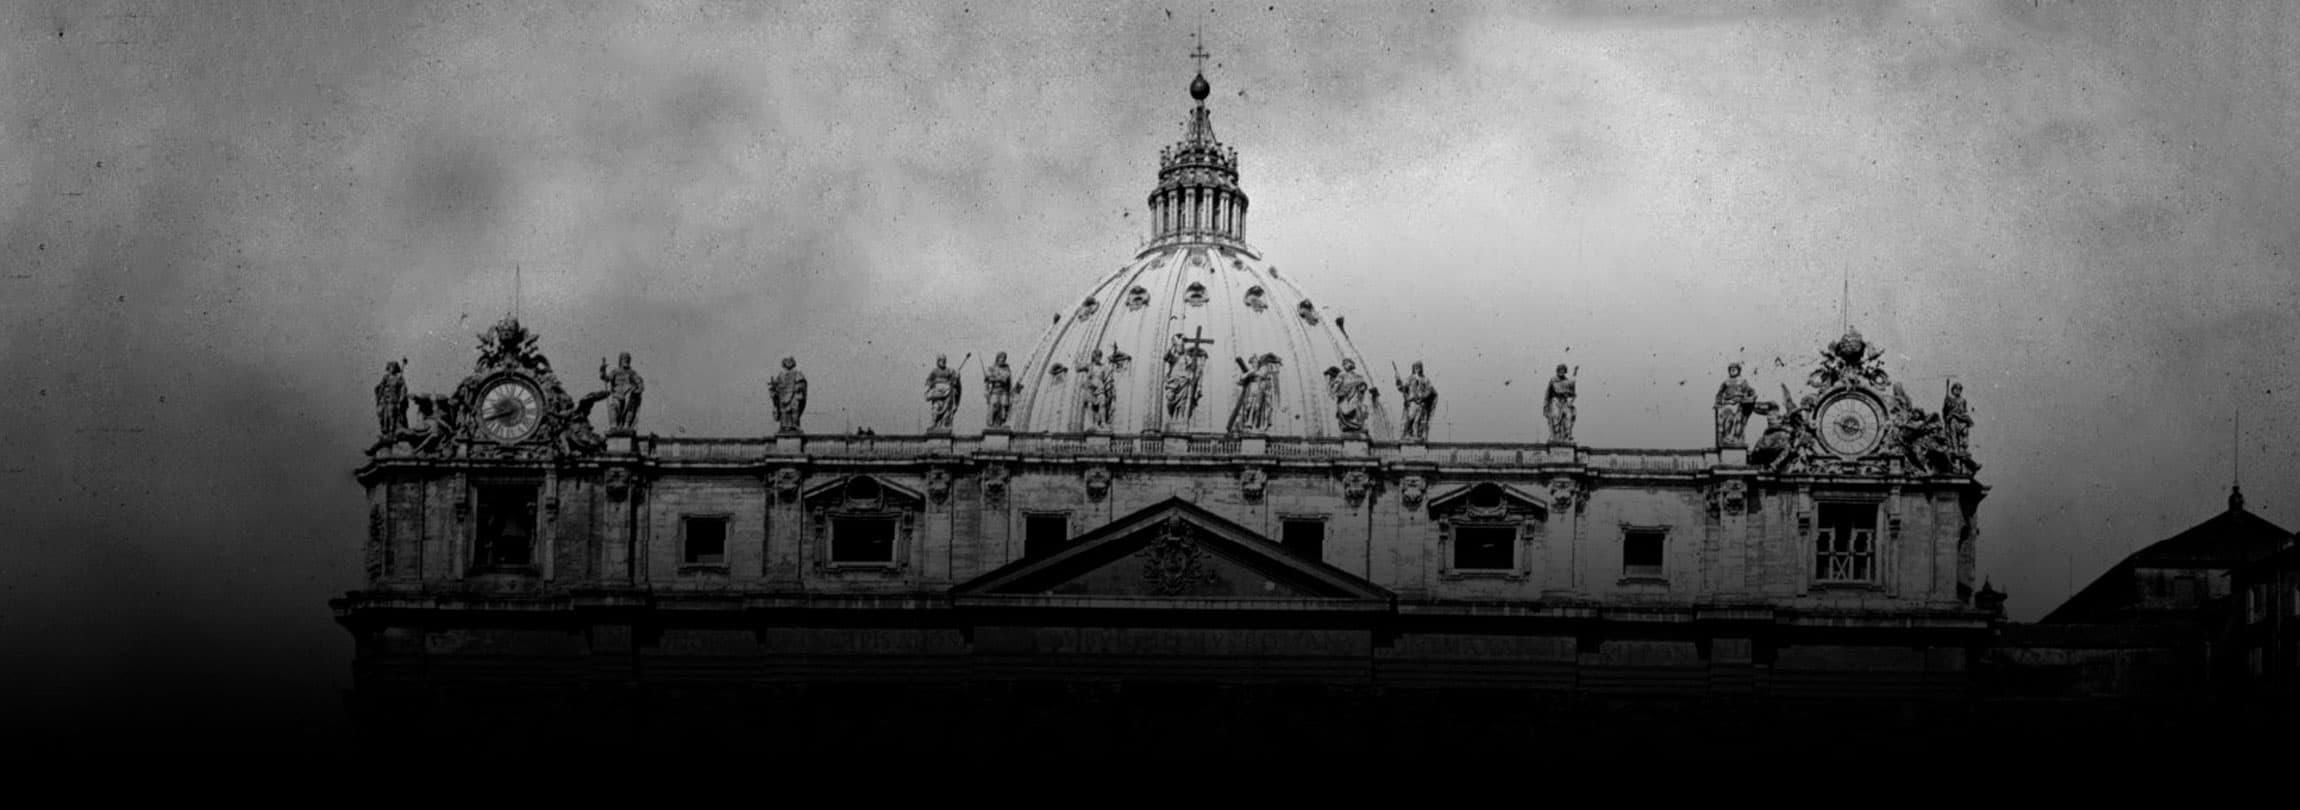 O falso Concílio dos teólogos liberais e as suas desastrosas consequências